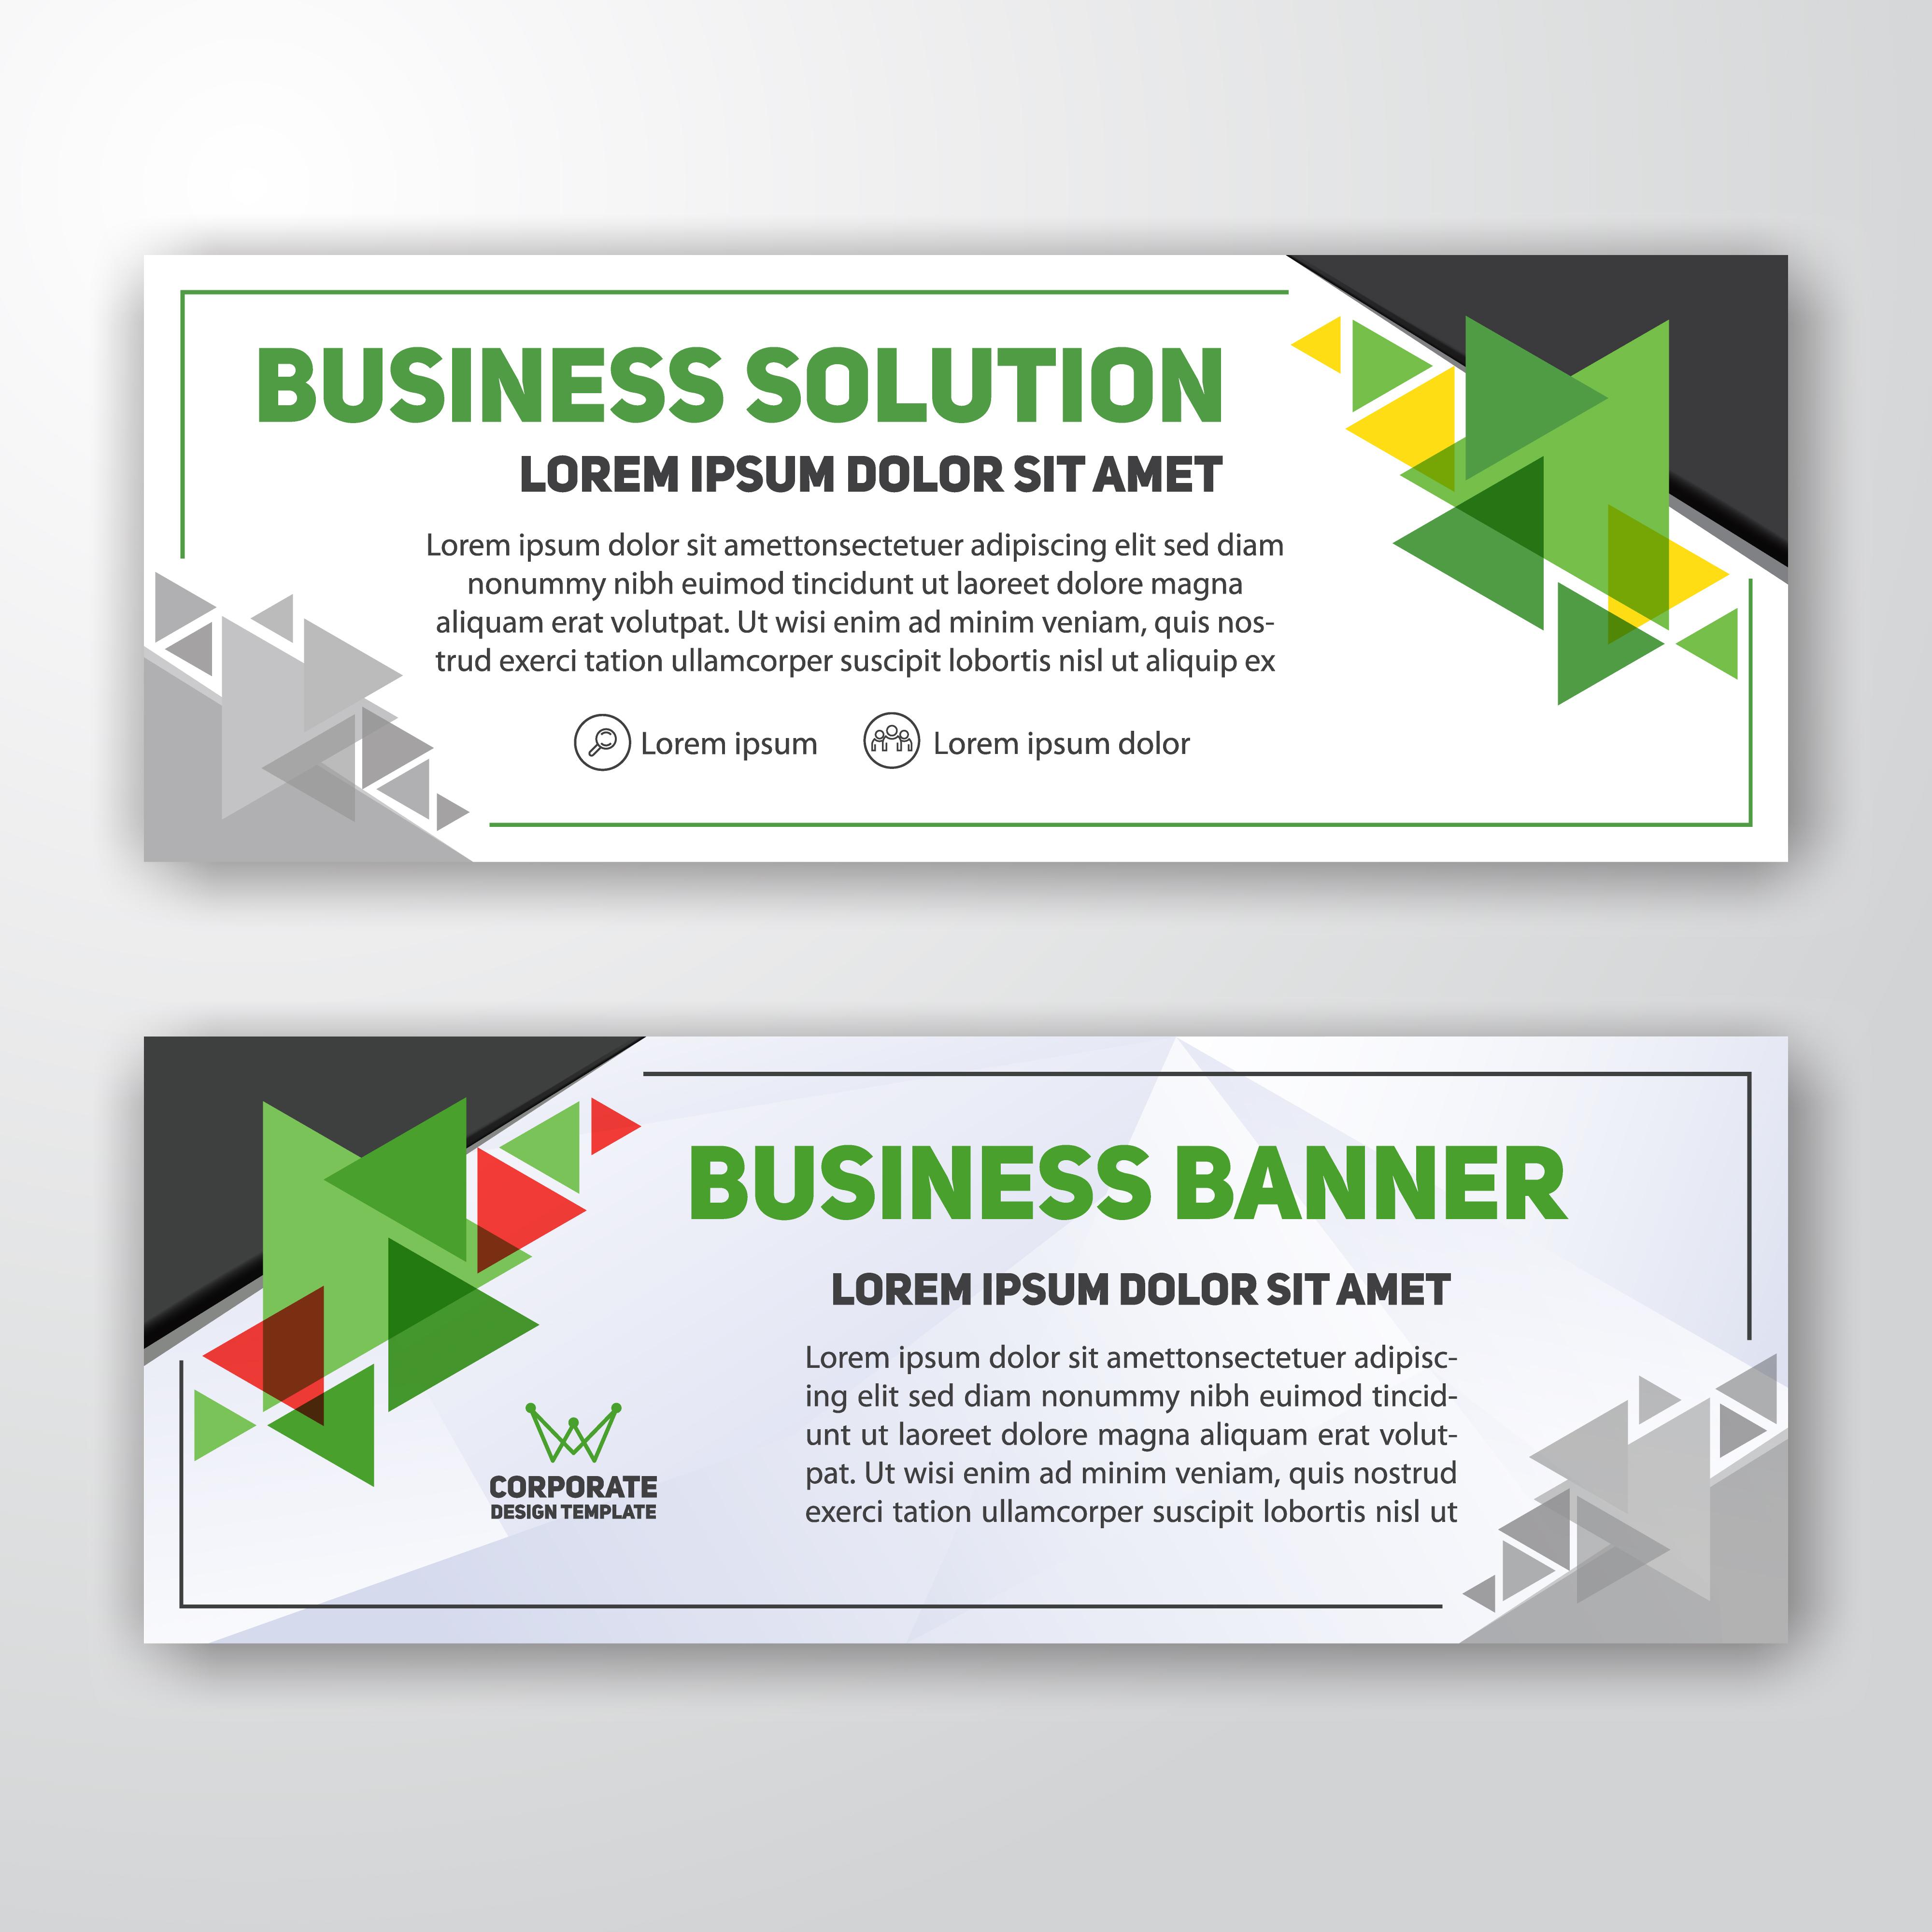 Contoh Spanduk: Modern Corporate Banner Background Design